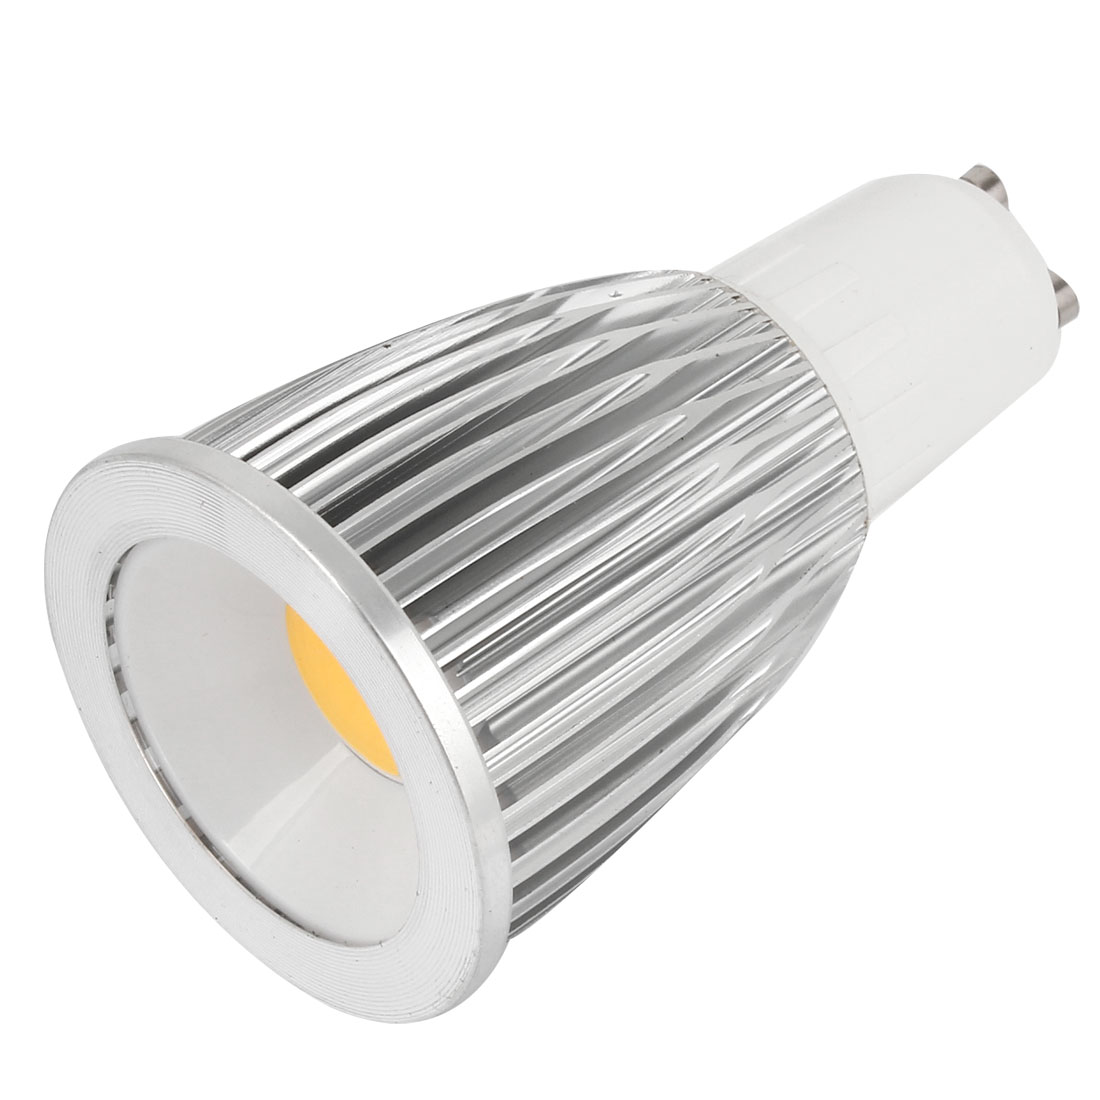 AC 85-265V 12W GU10 Warm White Light COB LED Downlight Spotlight Spot Bulb